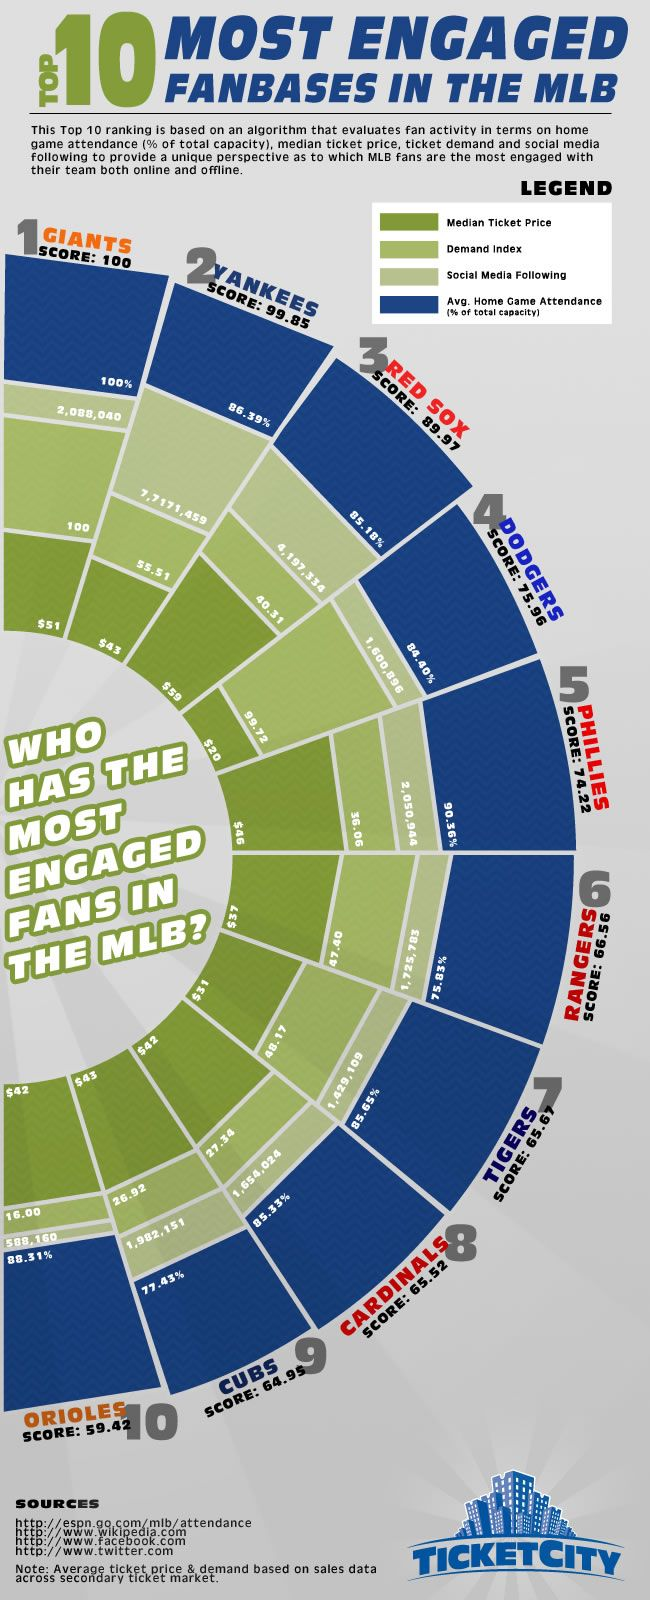 San Francisco Giants Lead All Mlb Teams In Fan Engagement All Mlb Teams San Francisco Giants Fan Engagement